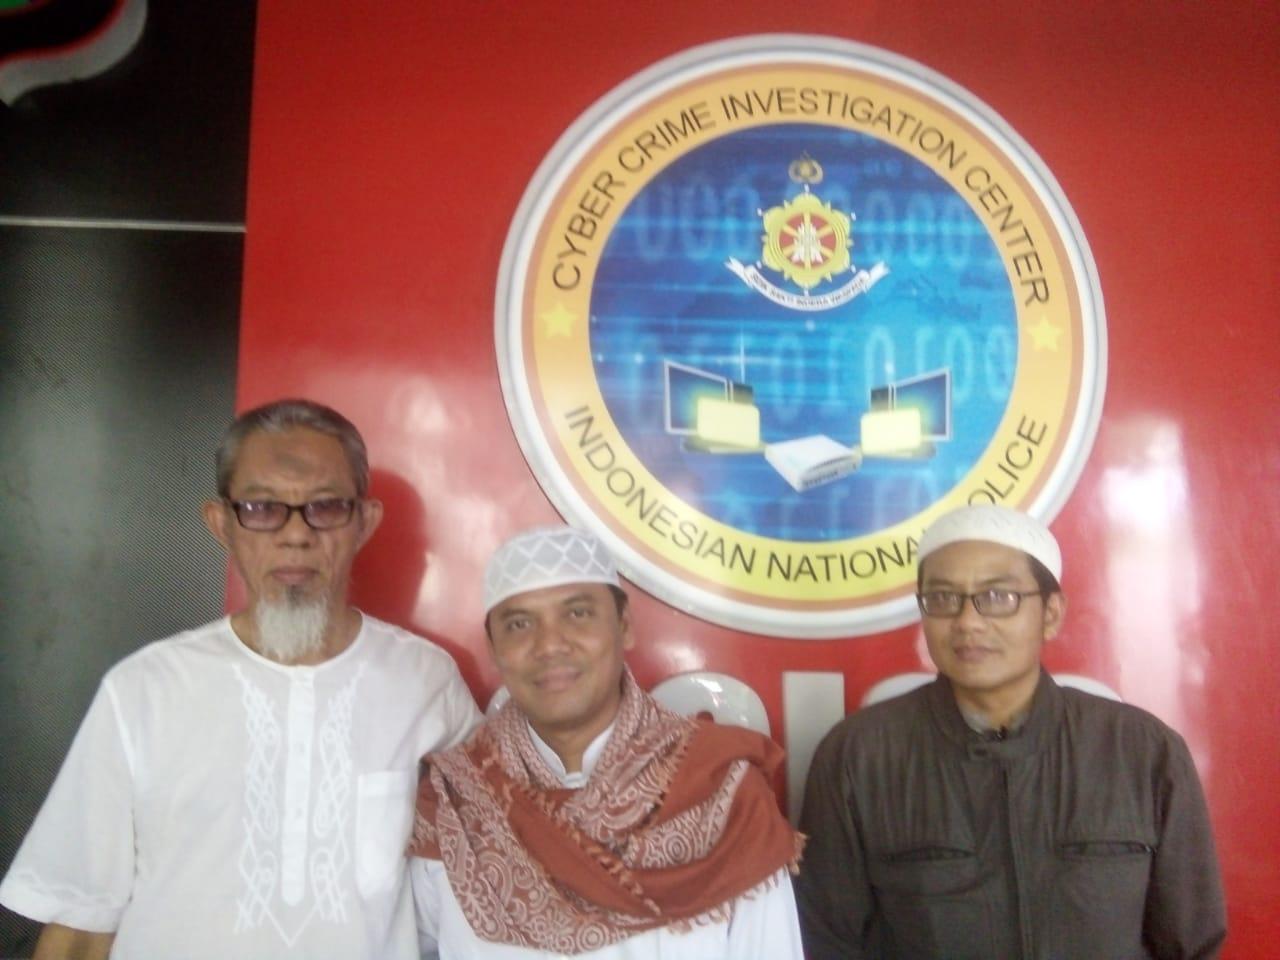 Diperiksa Polisi, Gus Nur: Bila Saya Dipenjara, Tetap Lanjutkan Dakwah!